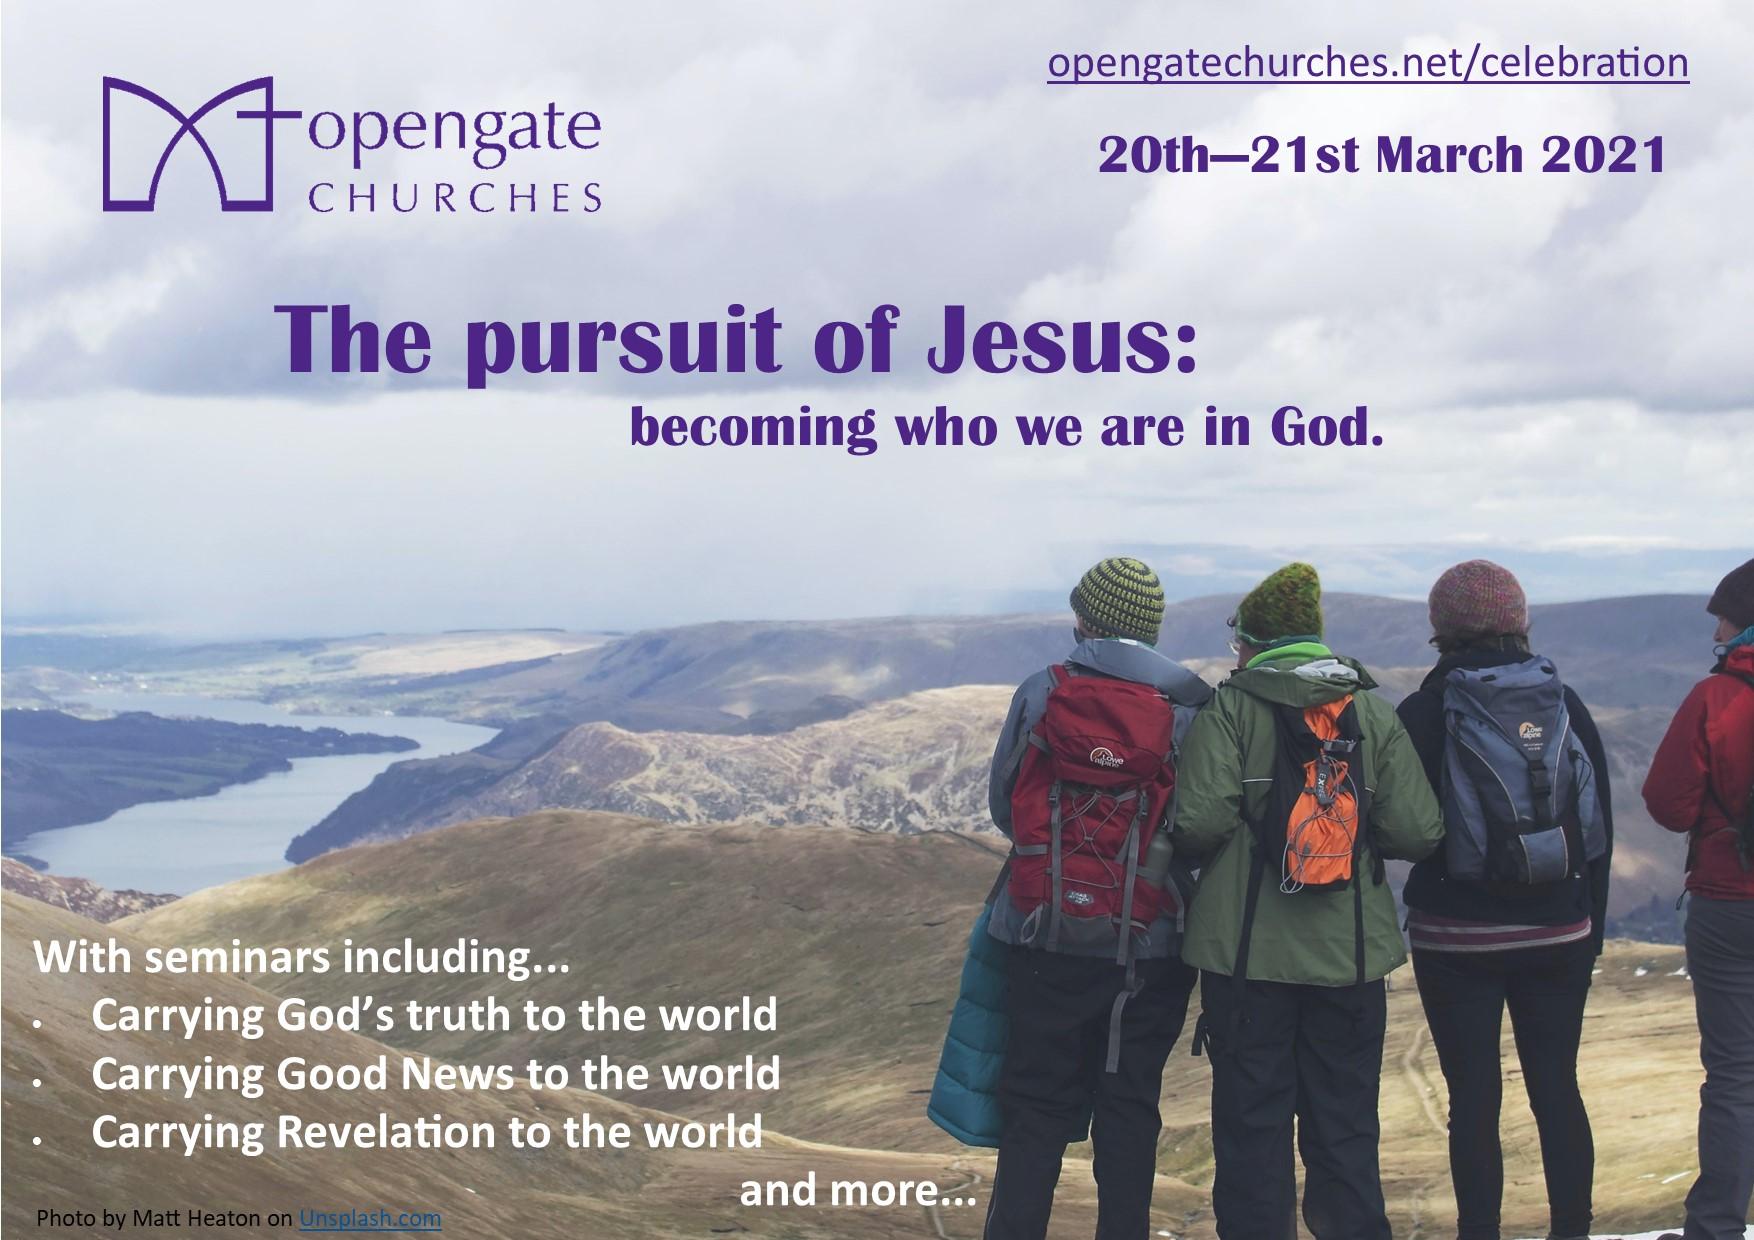 The pursuit of Jesus